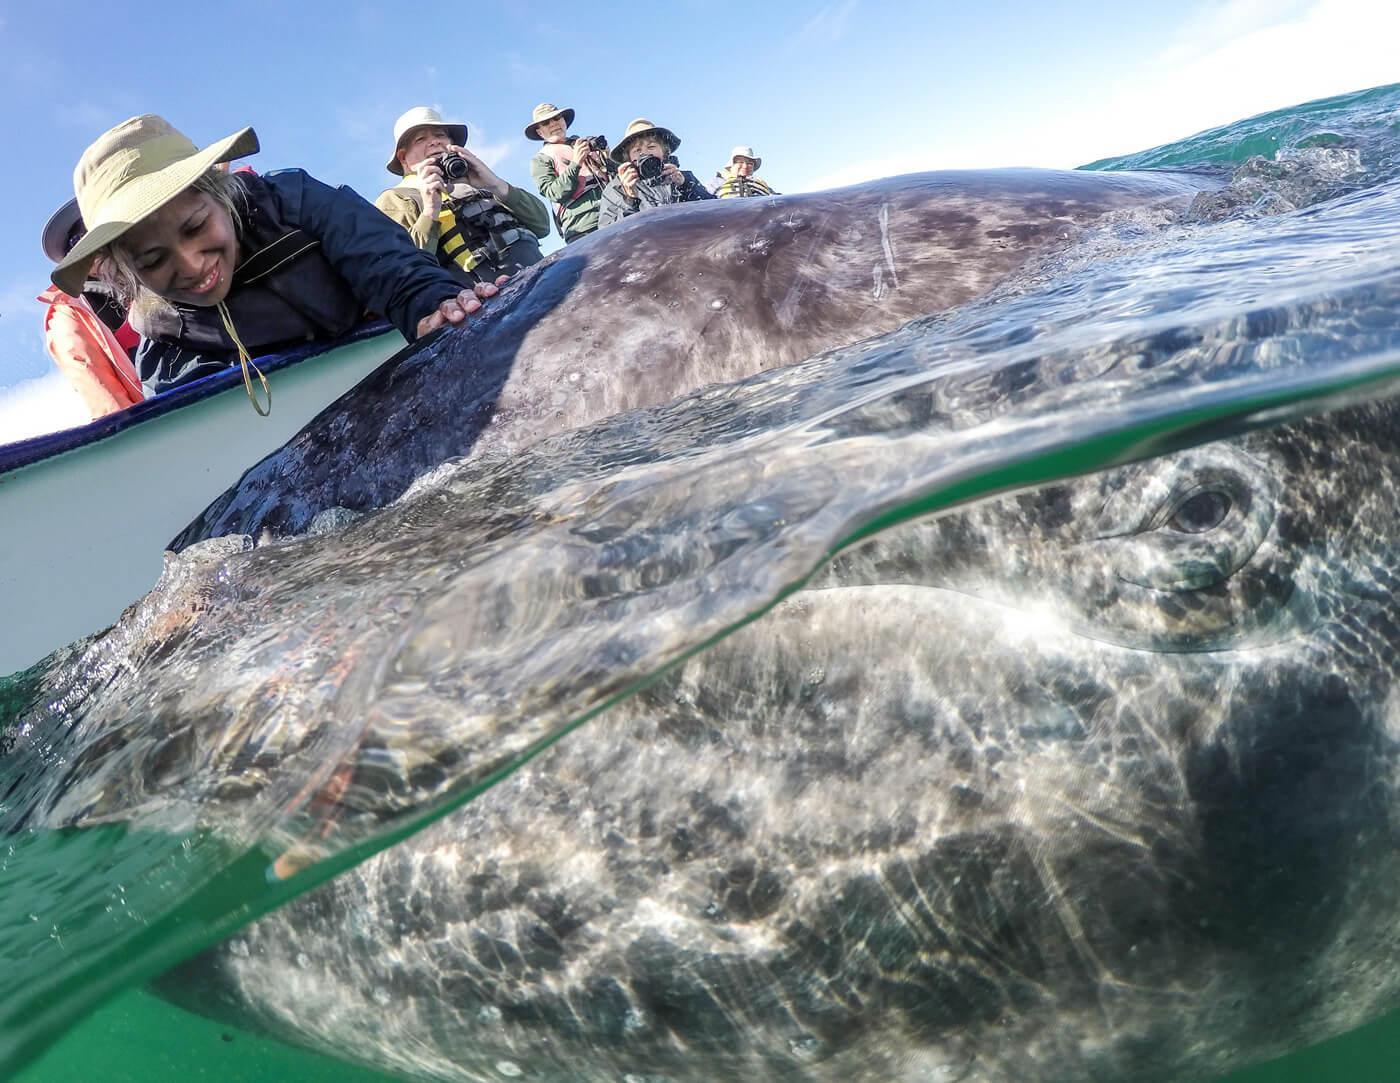 Passengers enjoy an intimate encounter with a gray whale. © Jose Sanchez